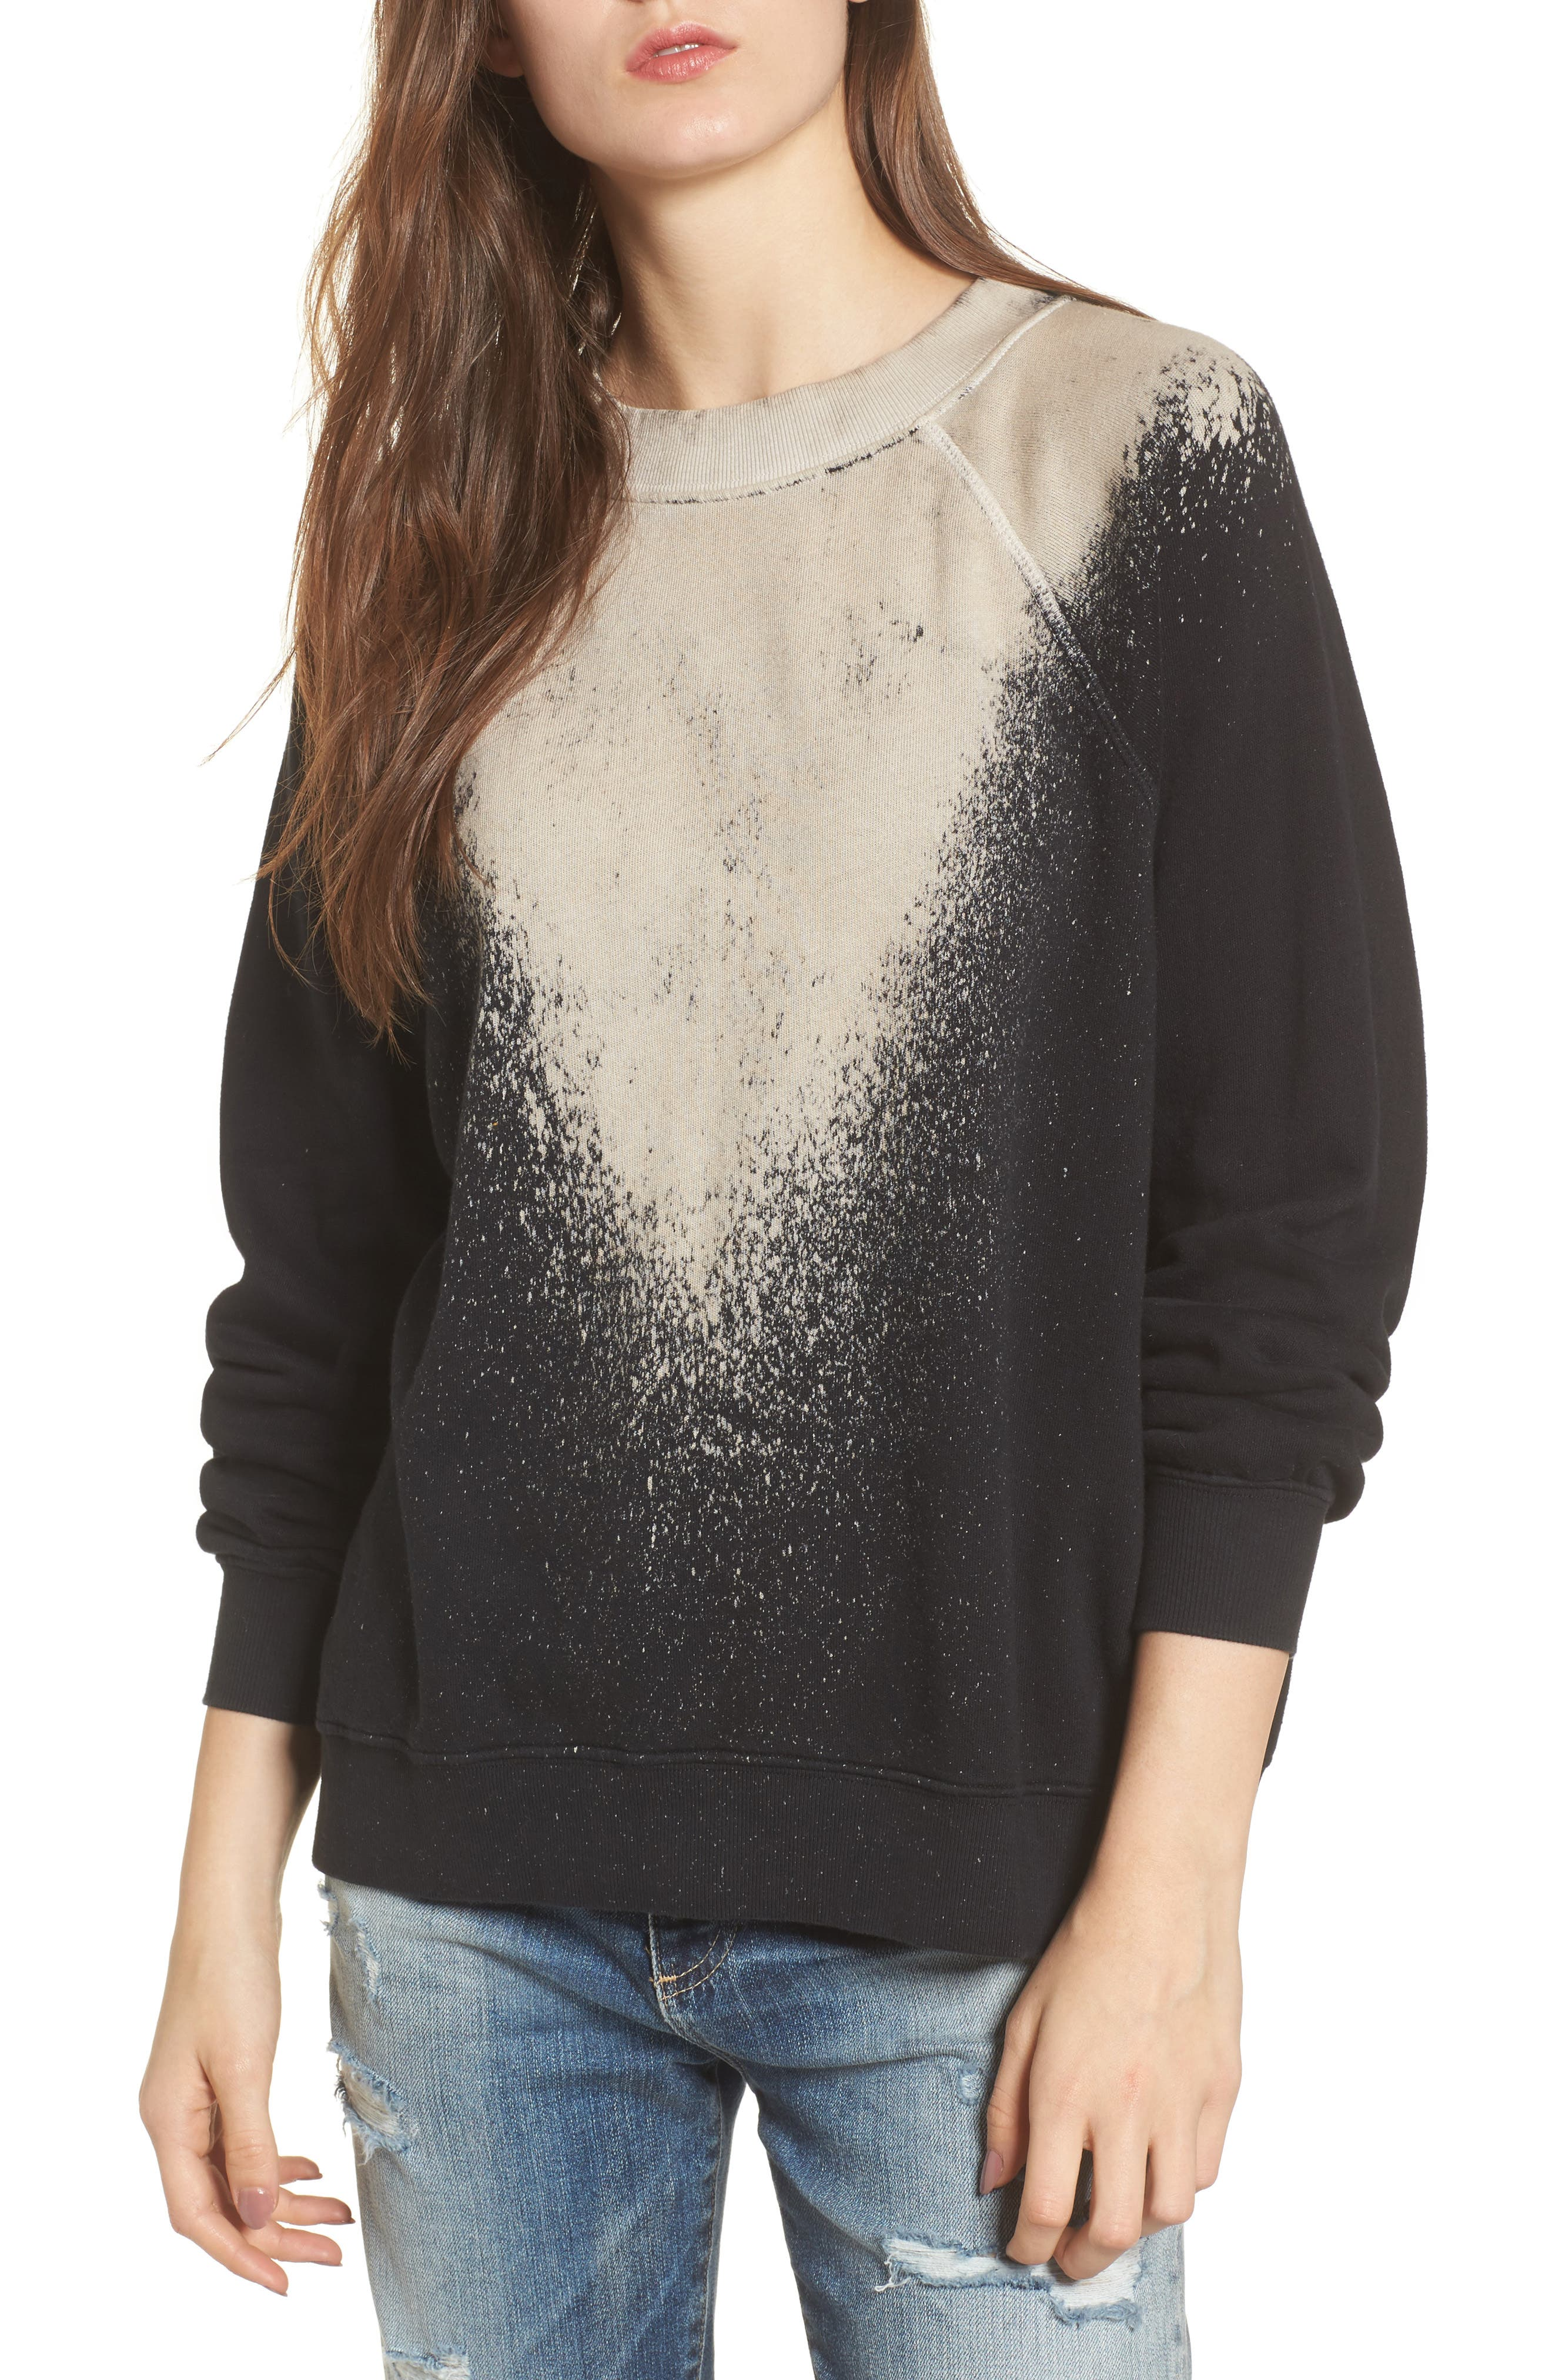 Wildfox Stardust - Sommers Sweatshirt